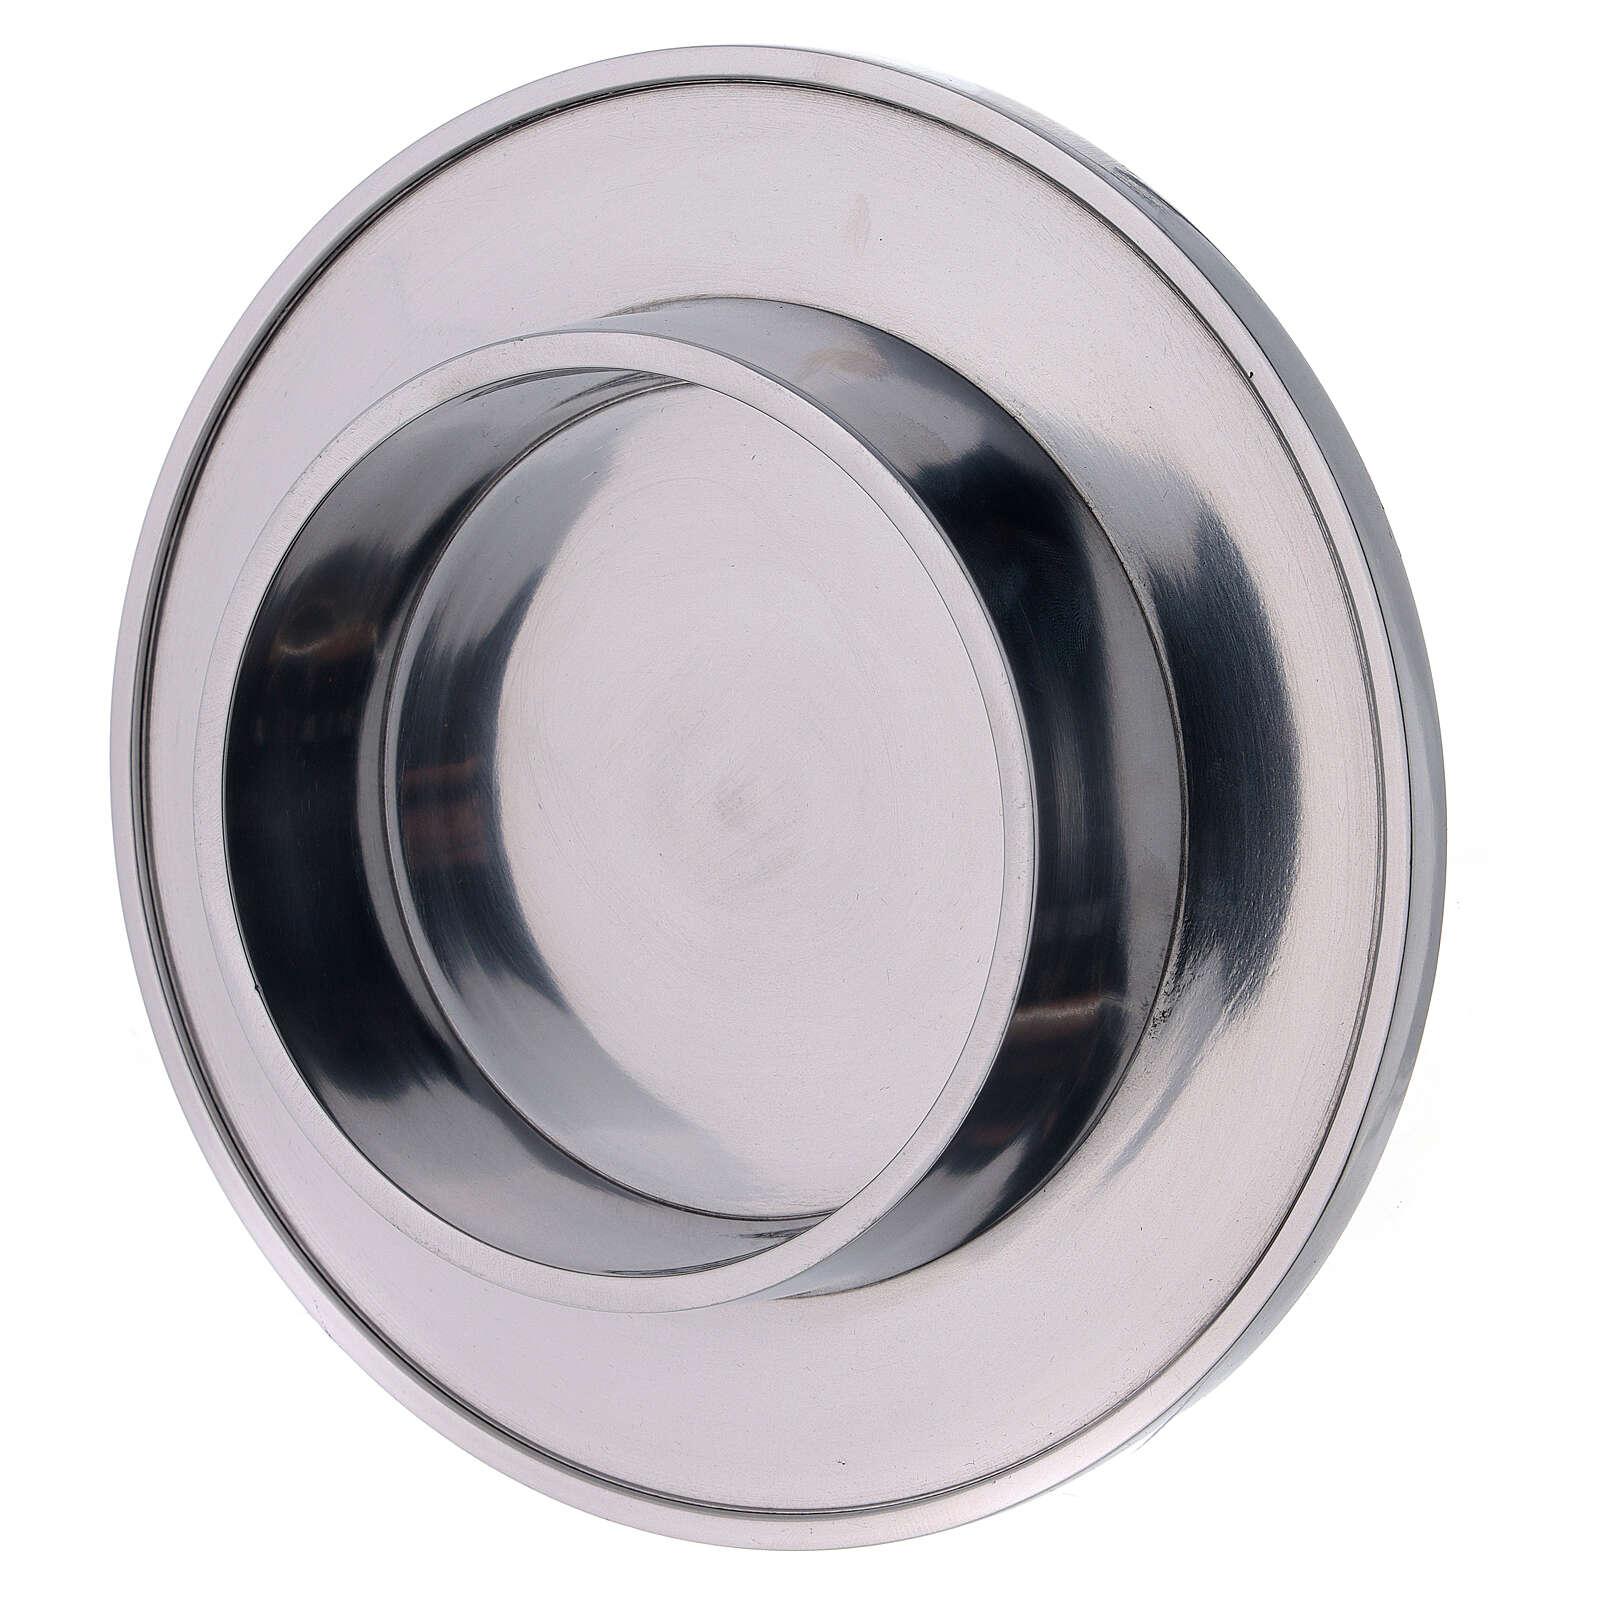 Bougeoir aluminium brillant diamètre 10 cm rond 4